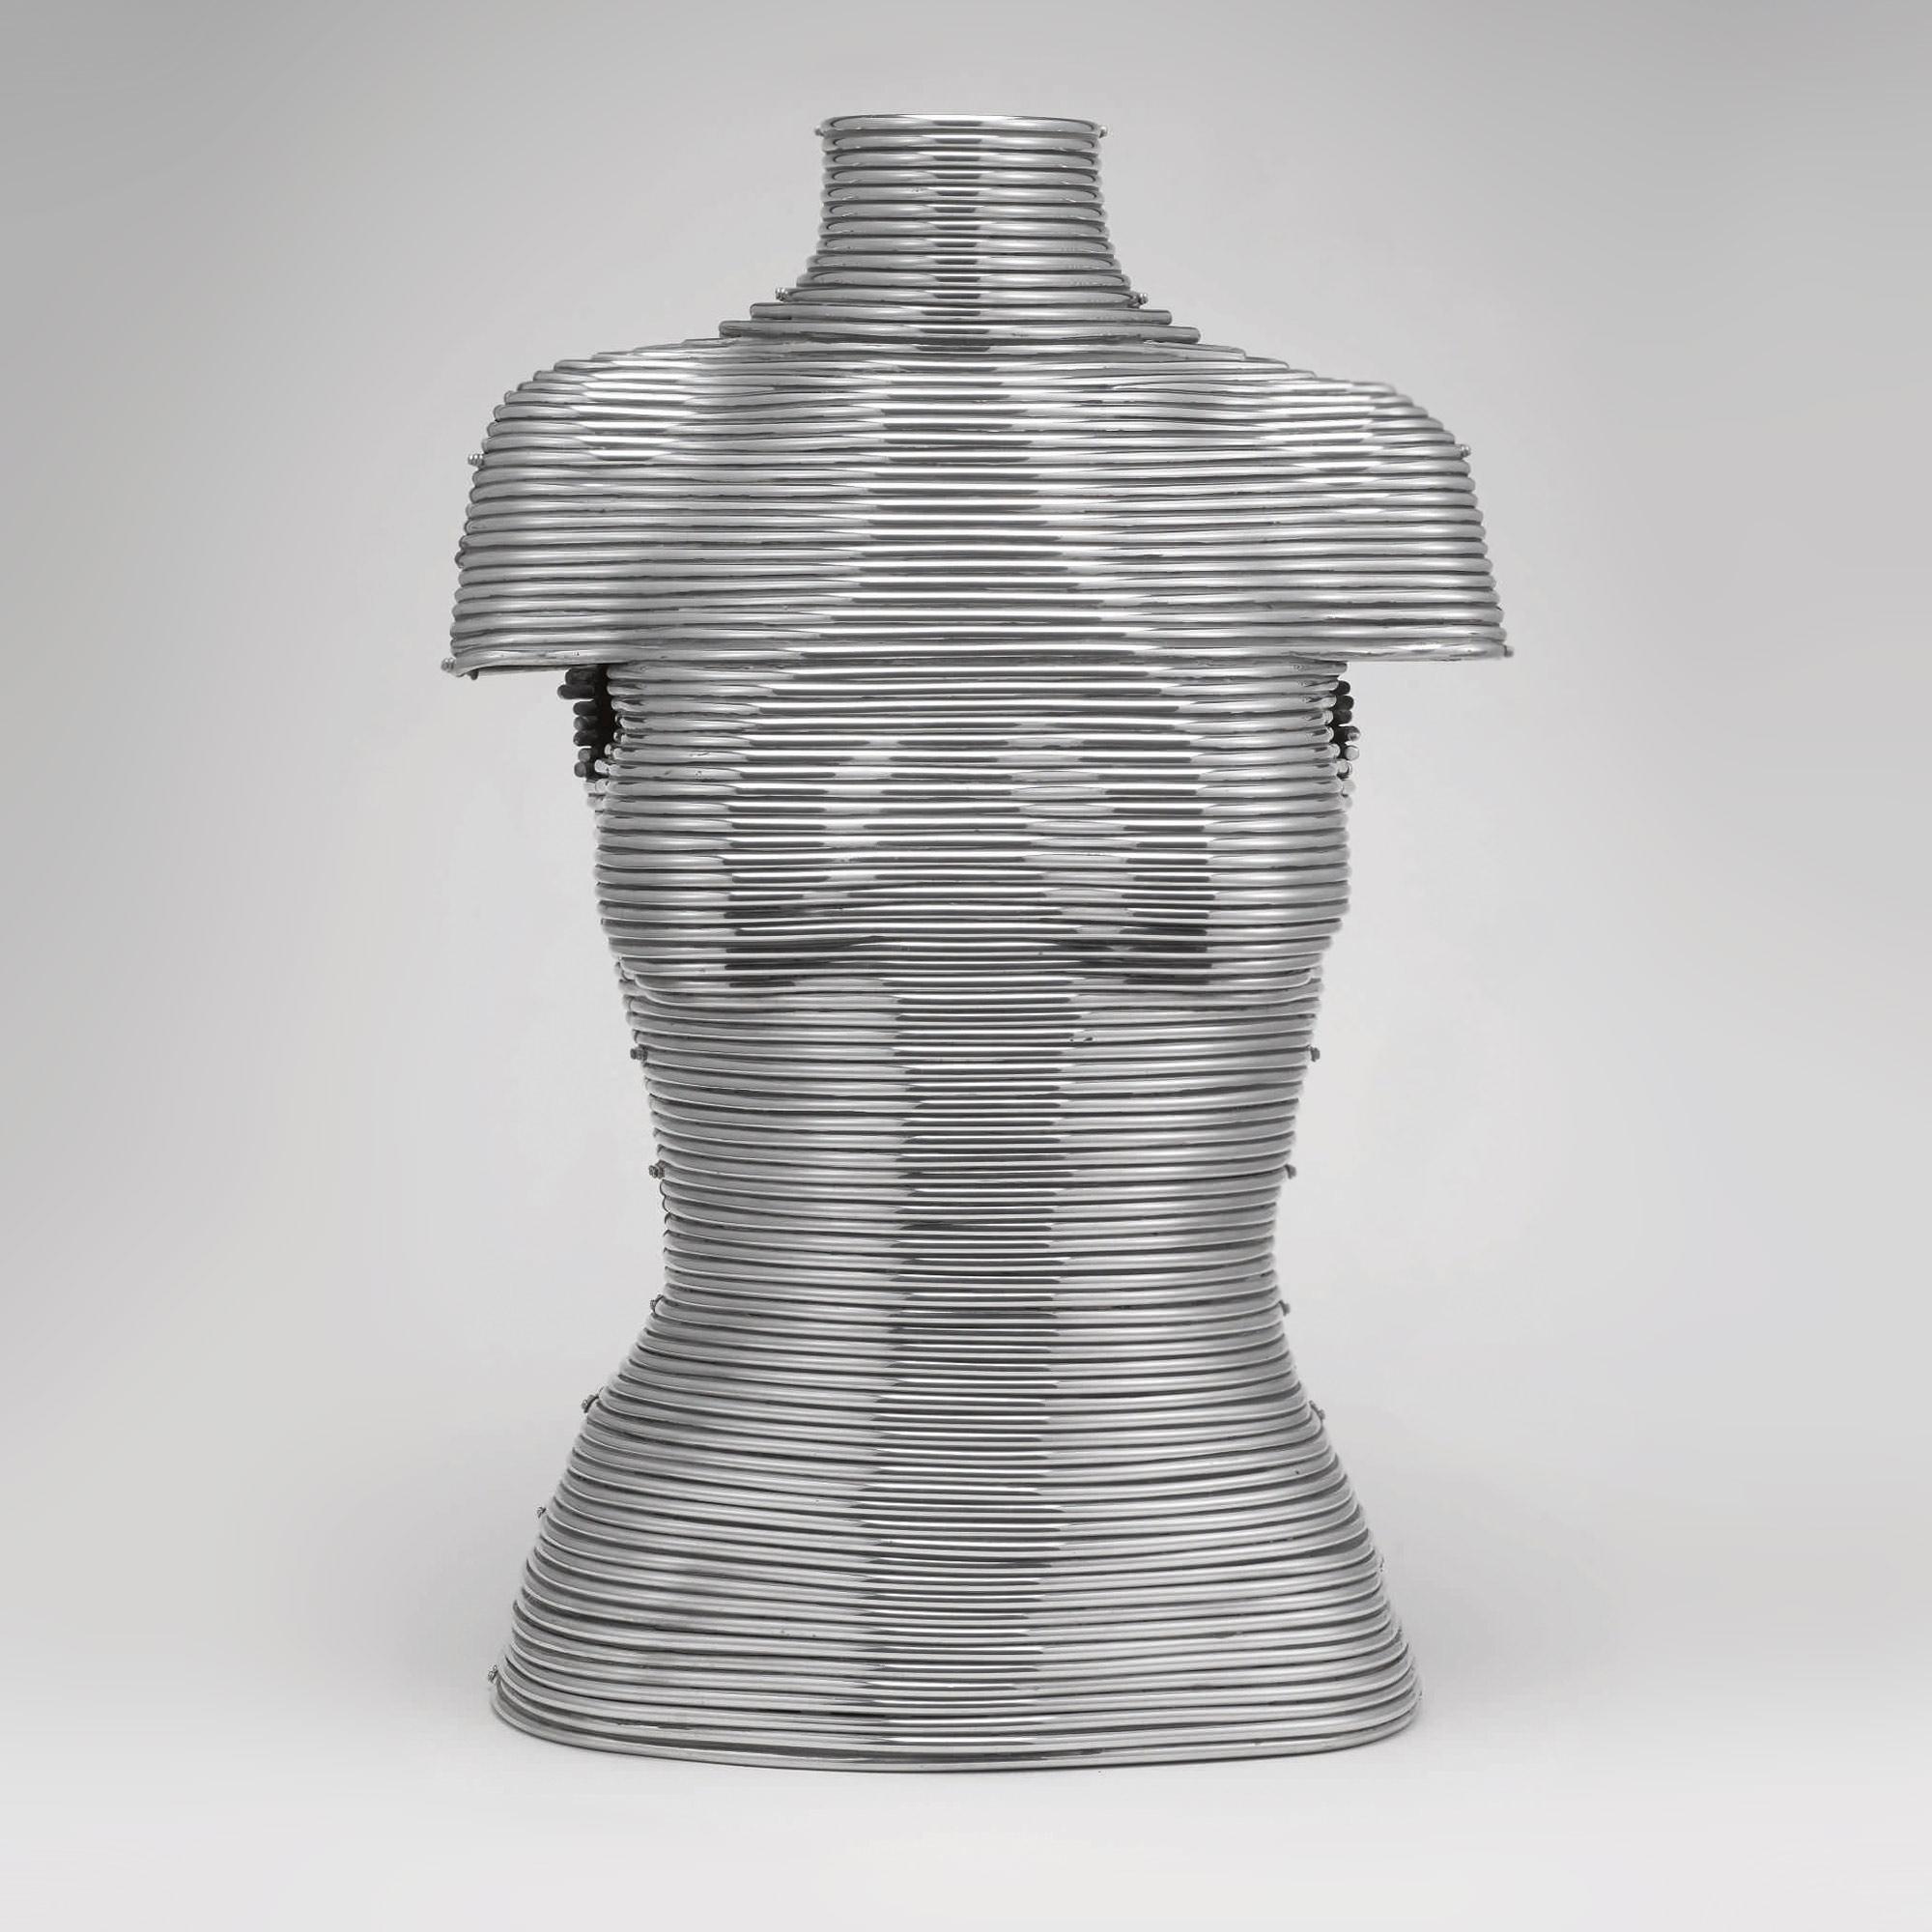 'Coiled Corset', Alexander McQueen's 'The Overlook' collection, Fall/Winter 1999